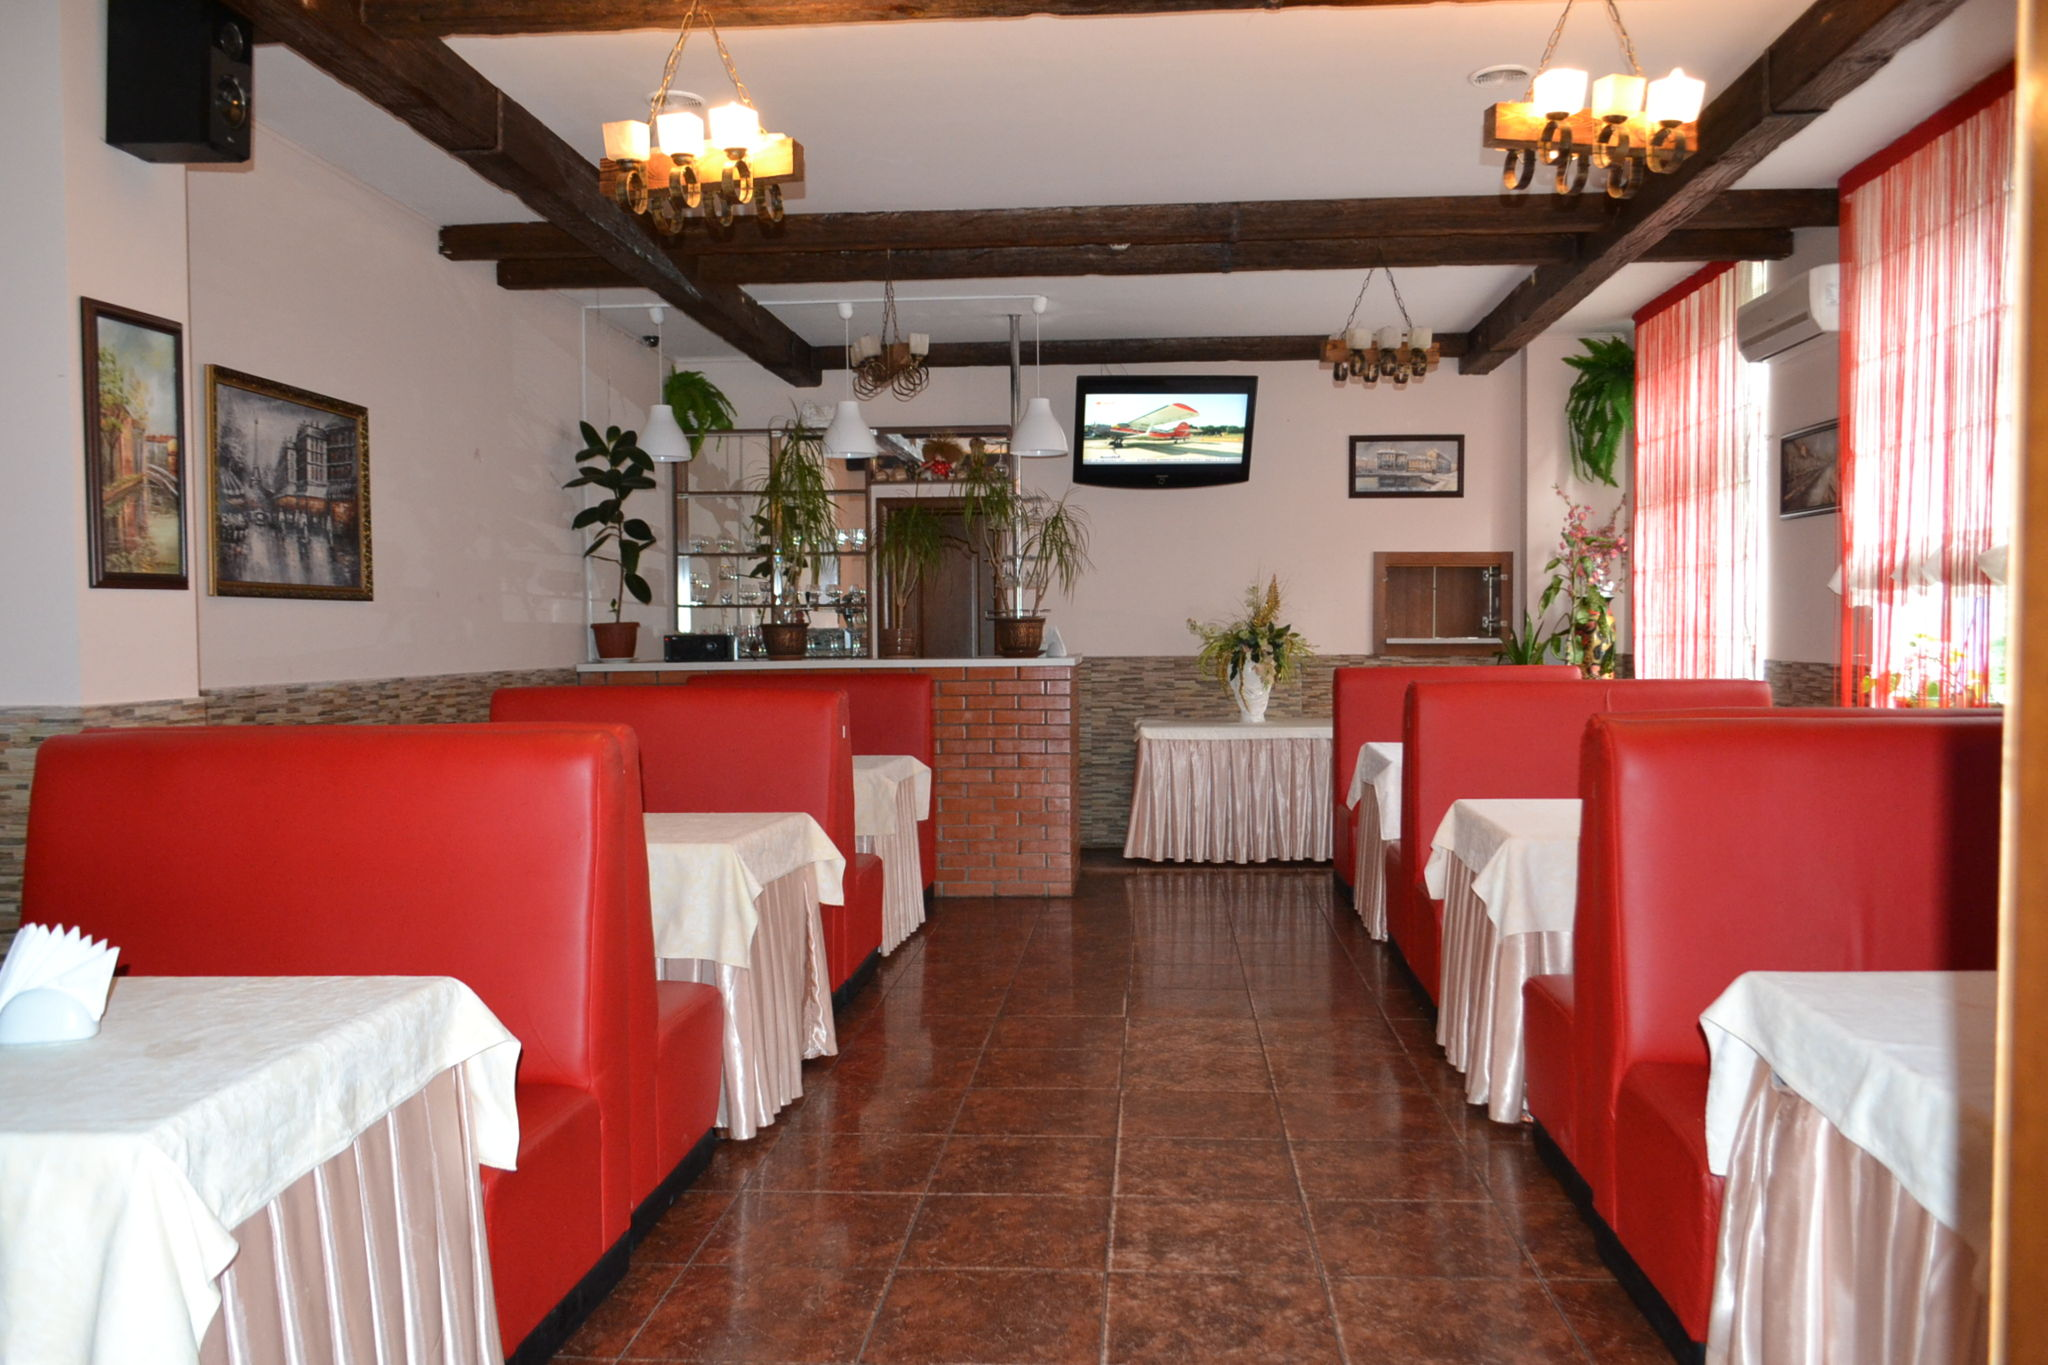 Ресторан, W-5563321, Чаадаева Петра, 2, Киев - Фото 8